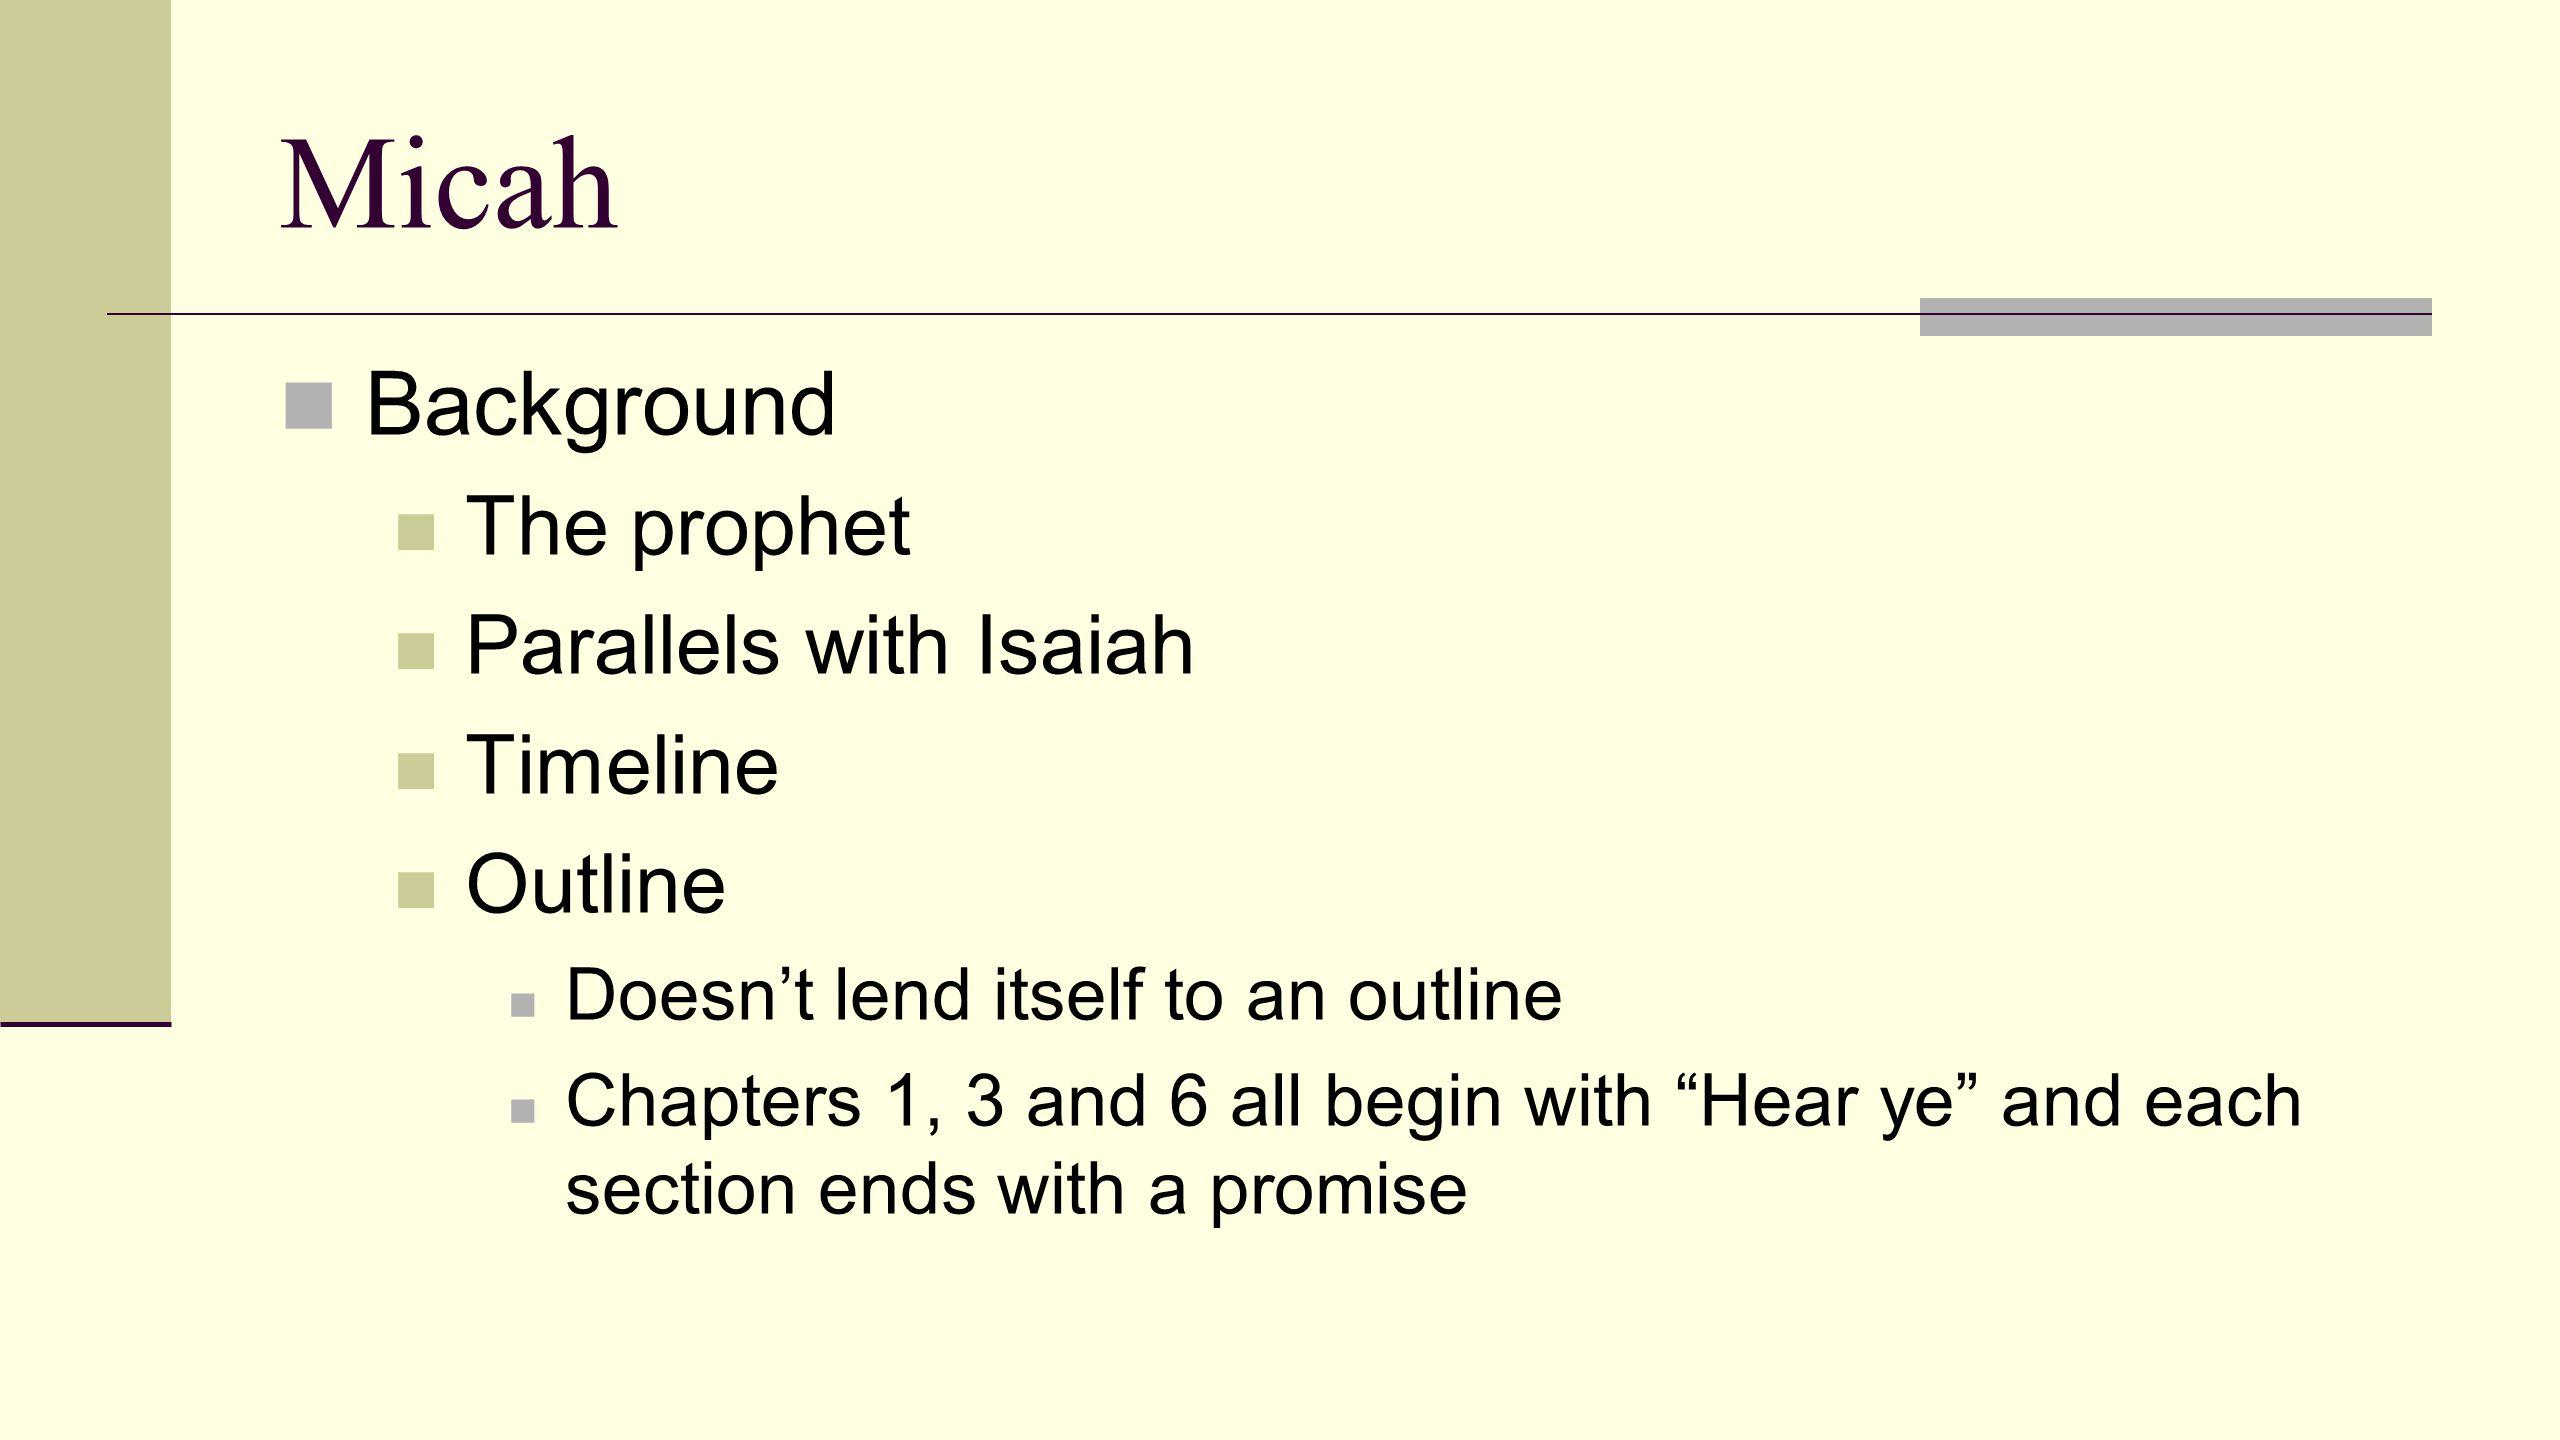 Micah Background Sins of Judah